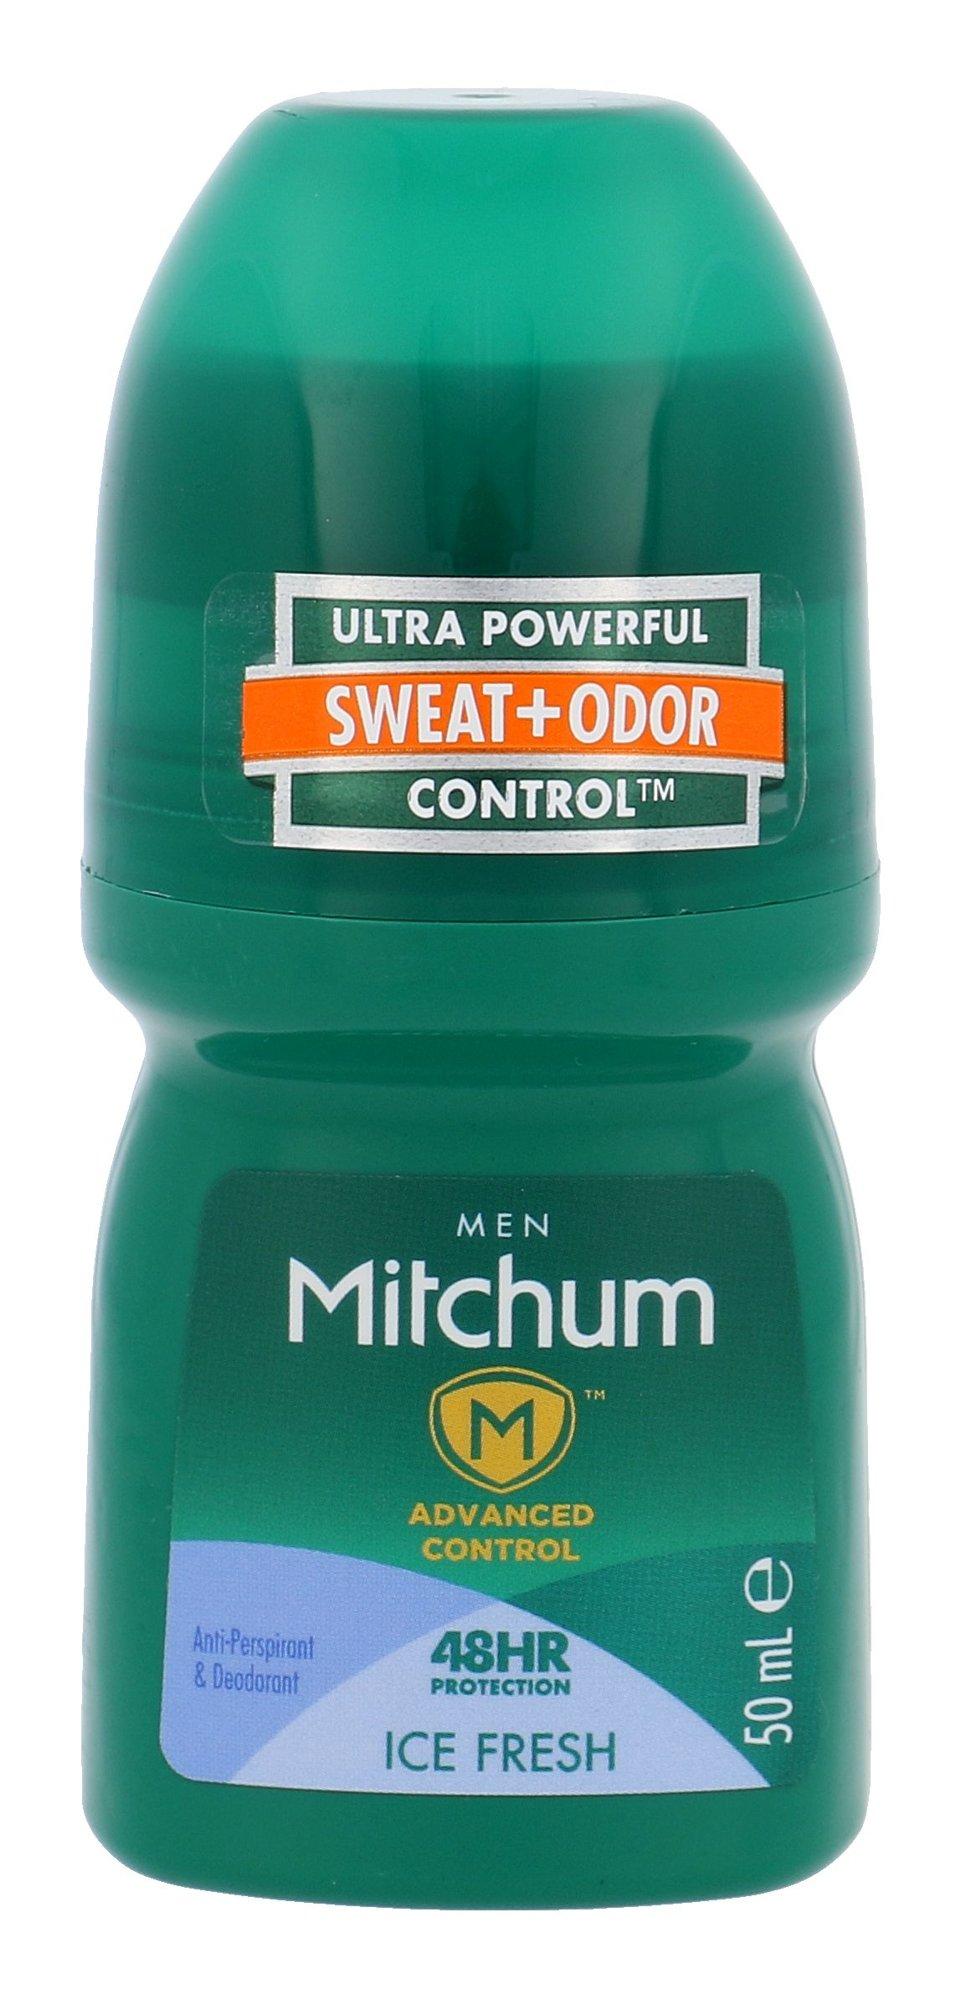 Mitchum Advanced Control Cosmetic 50ml  Ice Fresh